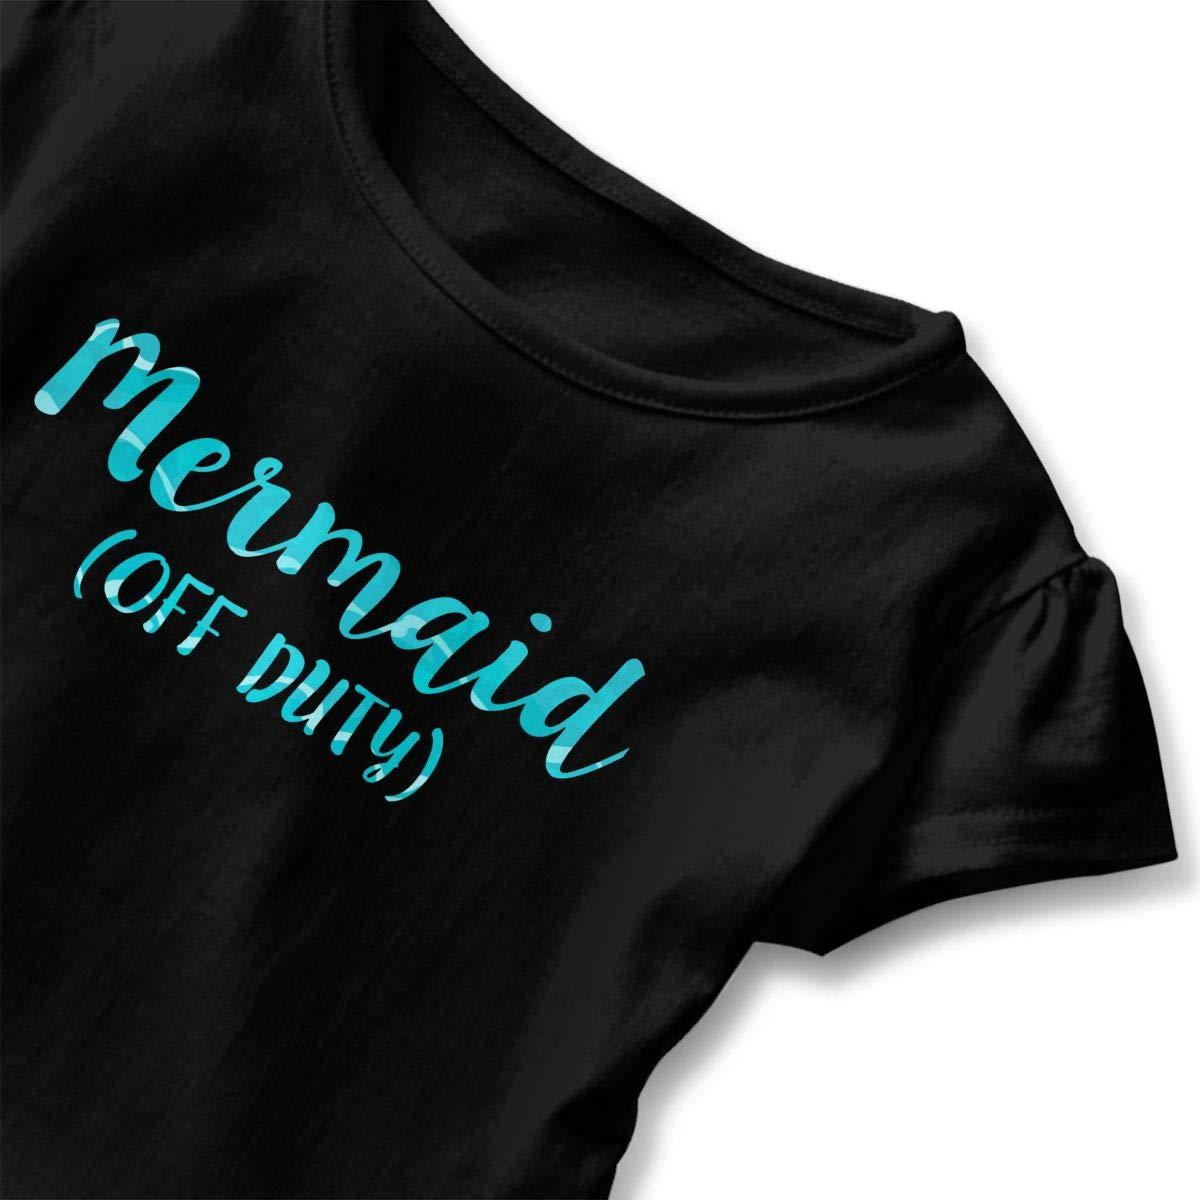 Off Duty Mermaid Toddler Girls T Shirt Kids Cotton Short Sleeve Ruffle Tee